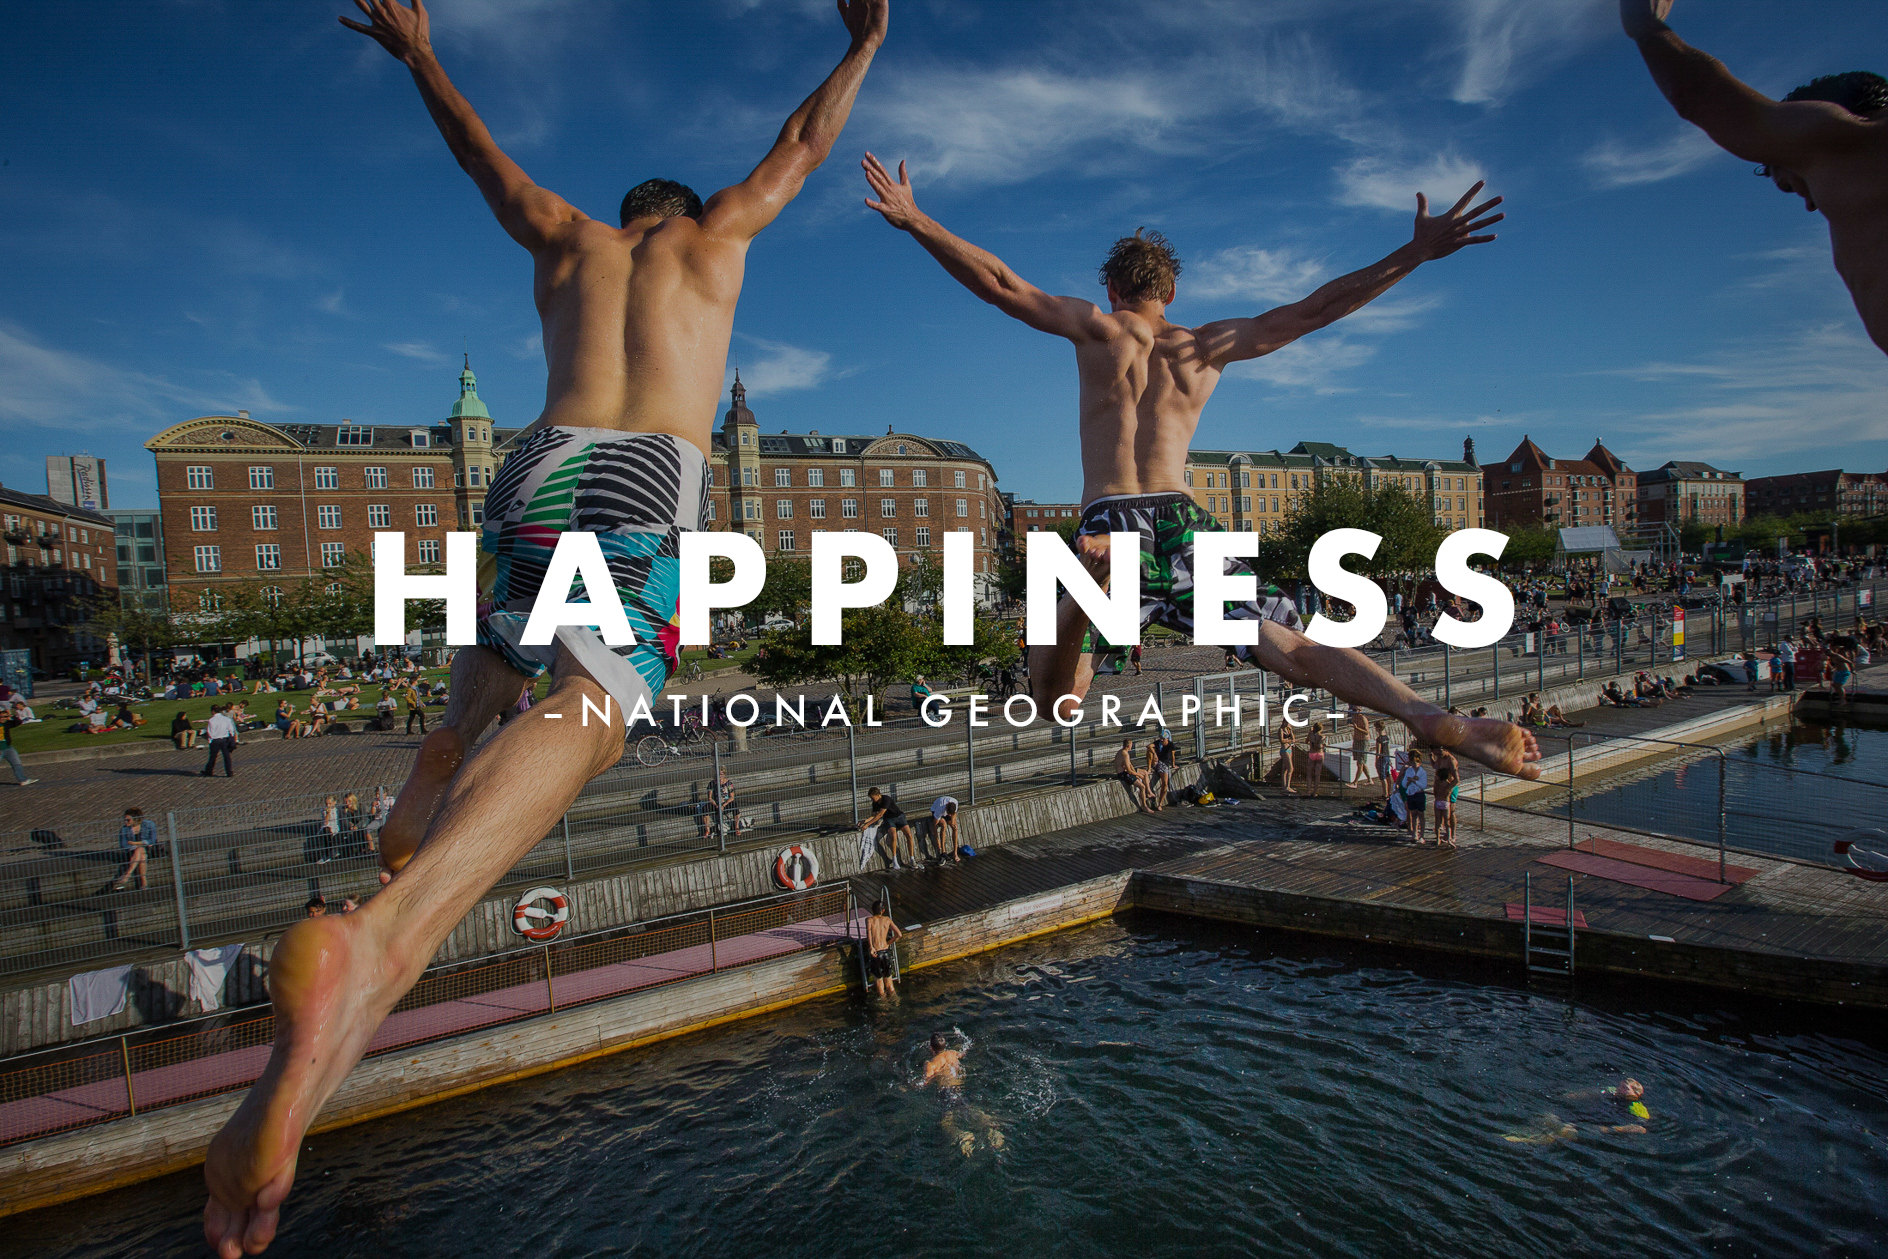 Cory-Richards-HAPPINESS.jpg